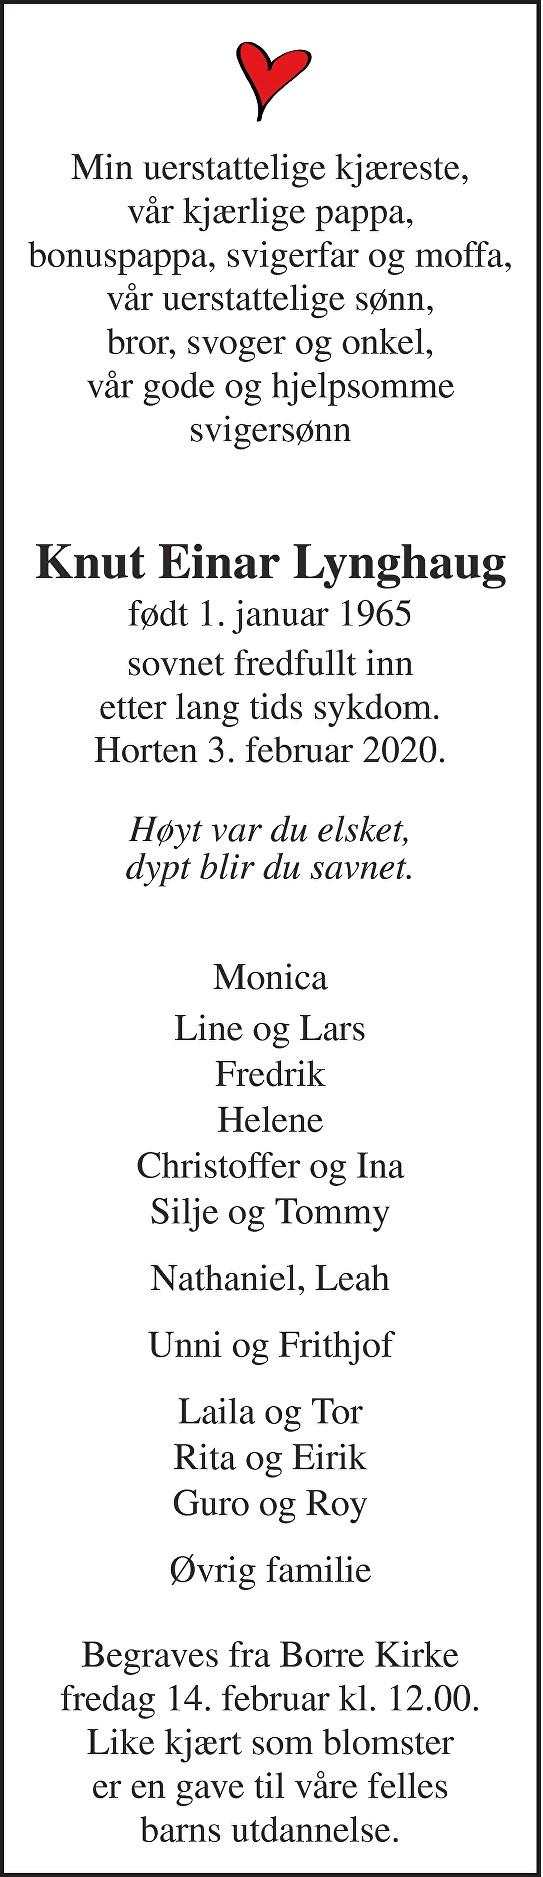 Knut Einar Lynghaug Dødsannonse